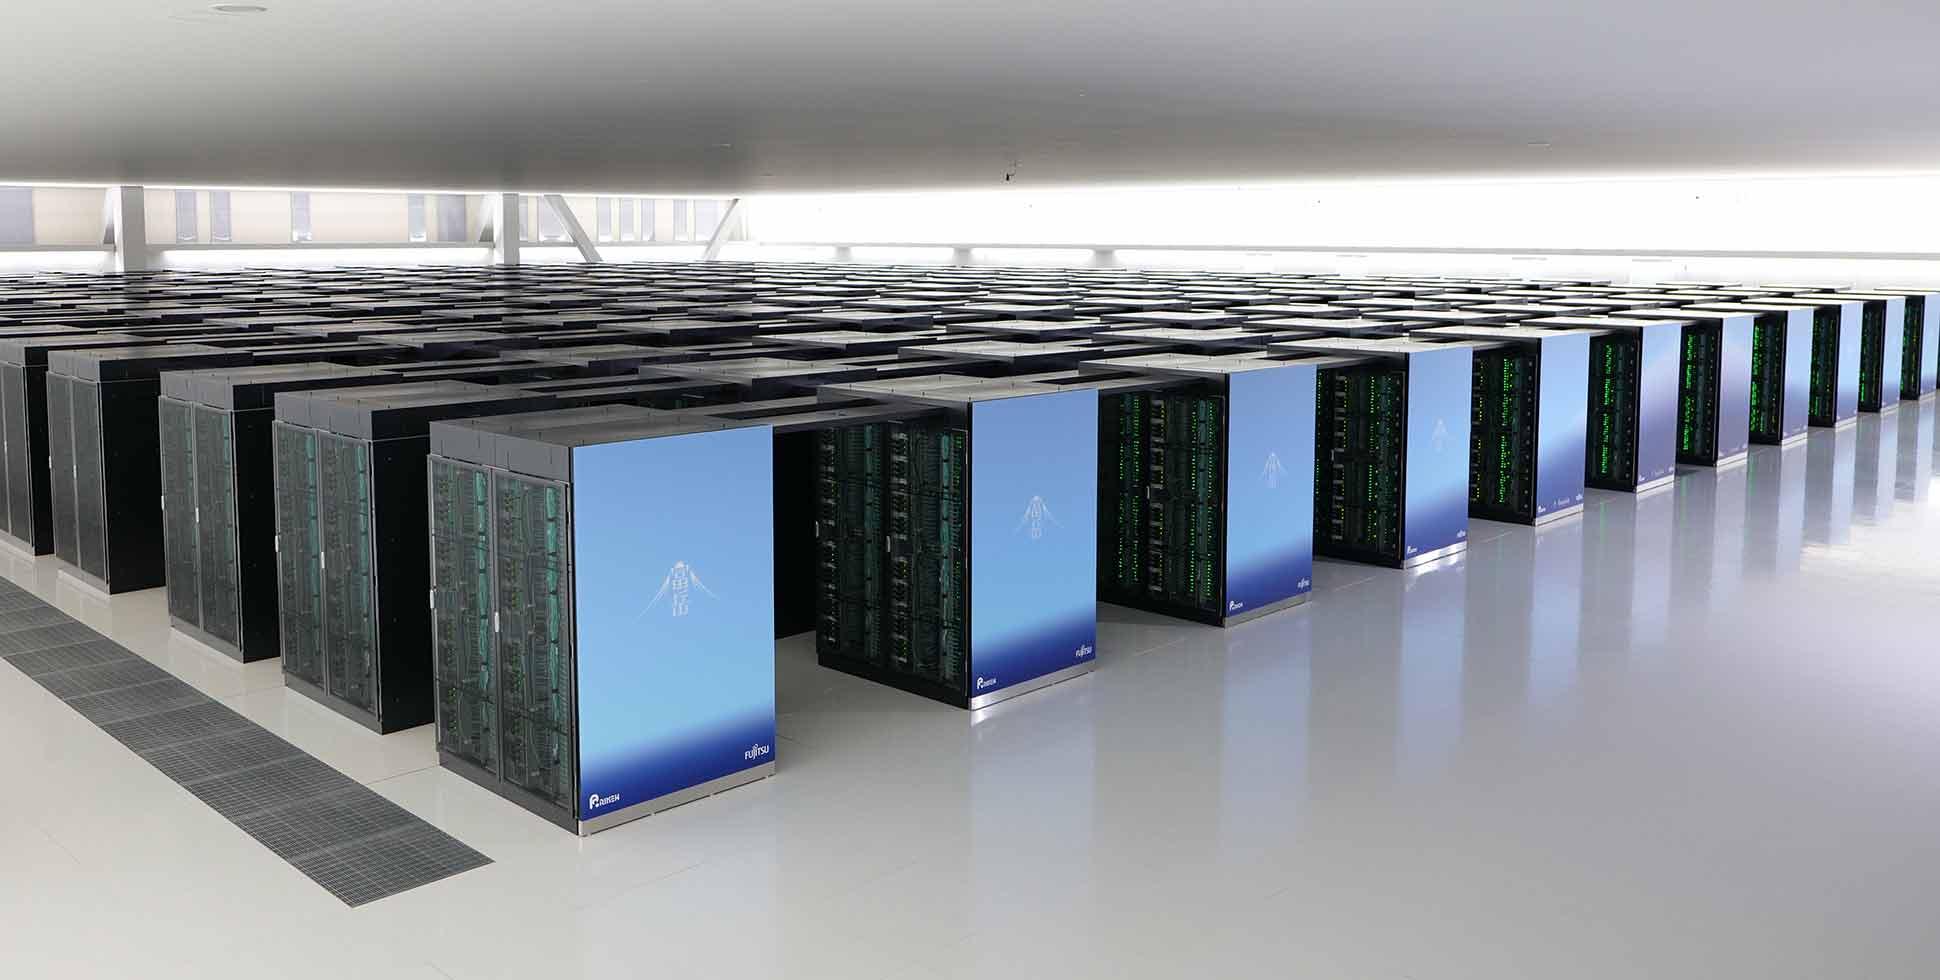 Fujitsu A64FX: Arm-powered Heart of World's Fastest Supercomputer